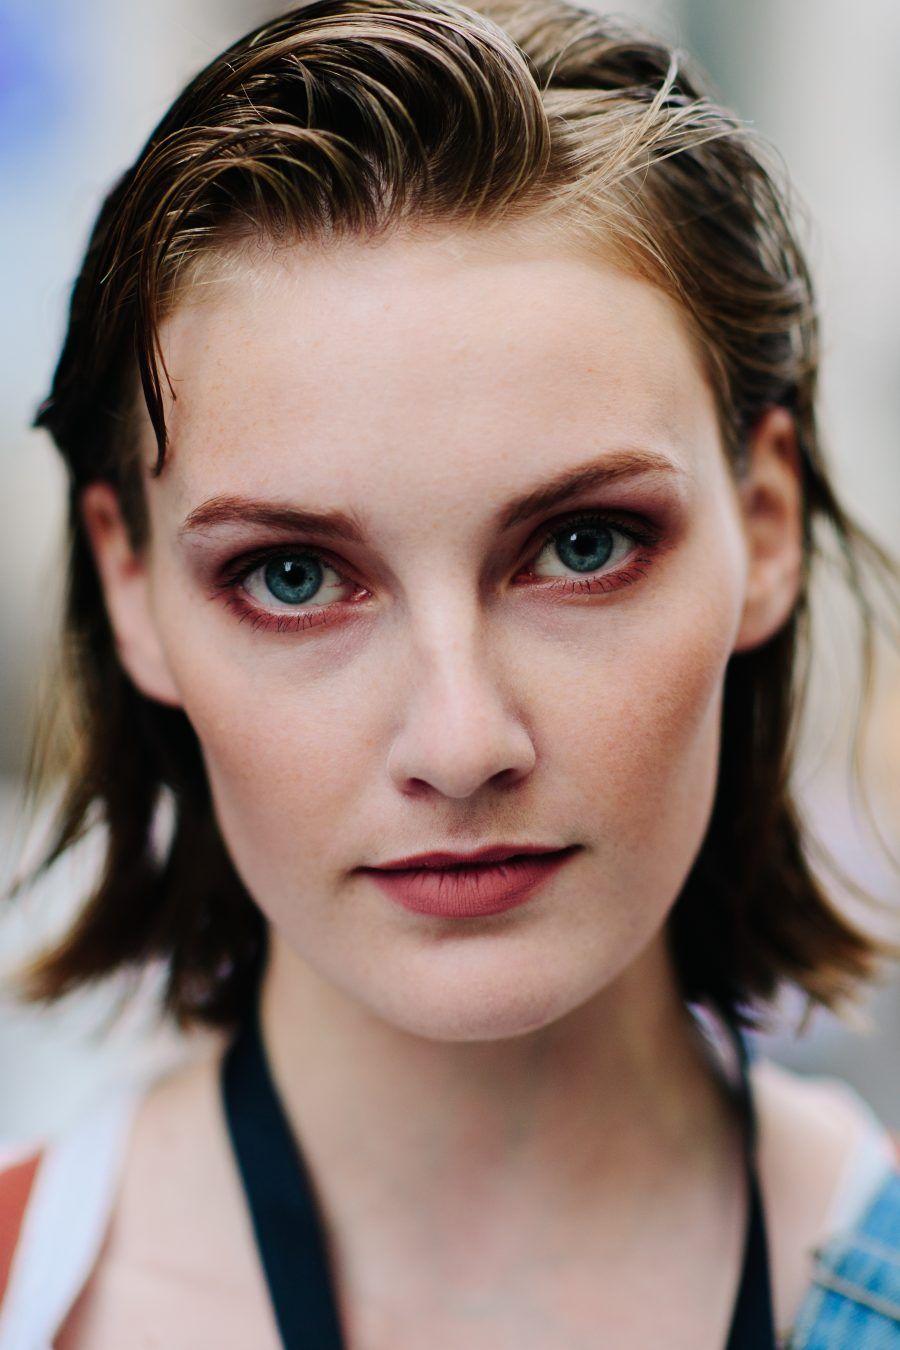 Le 21ème / Elisabeth Bakke-Hareide | Oslo  // #Fashion, #FashionBlog, #FashionBlogger, #Ootd, #OutfitOfTheDay, #StreetStyle, #Style